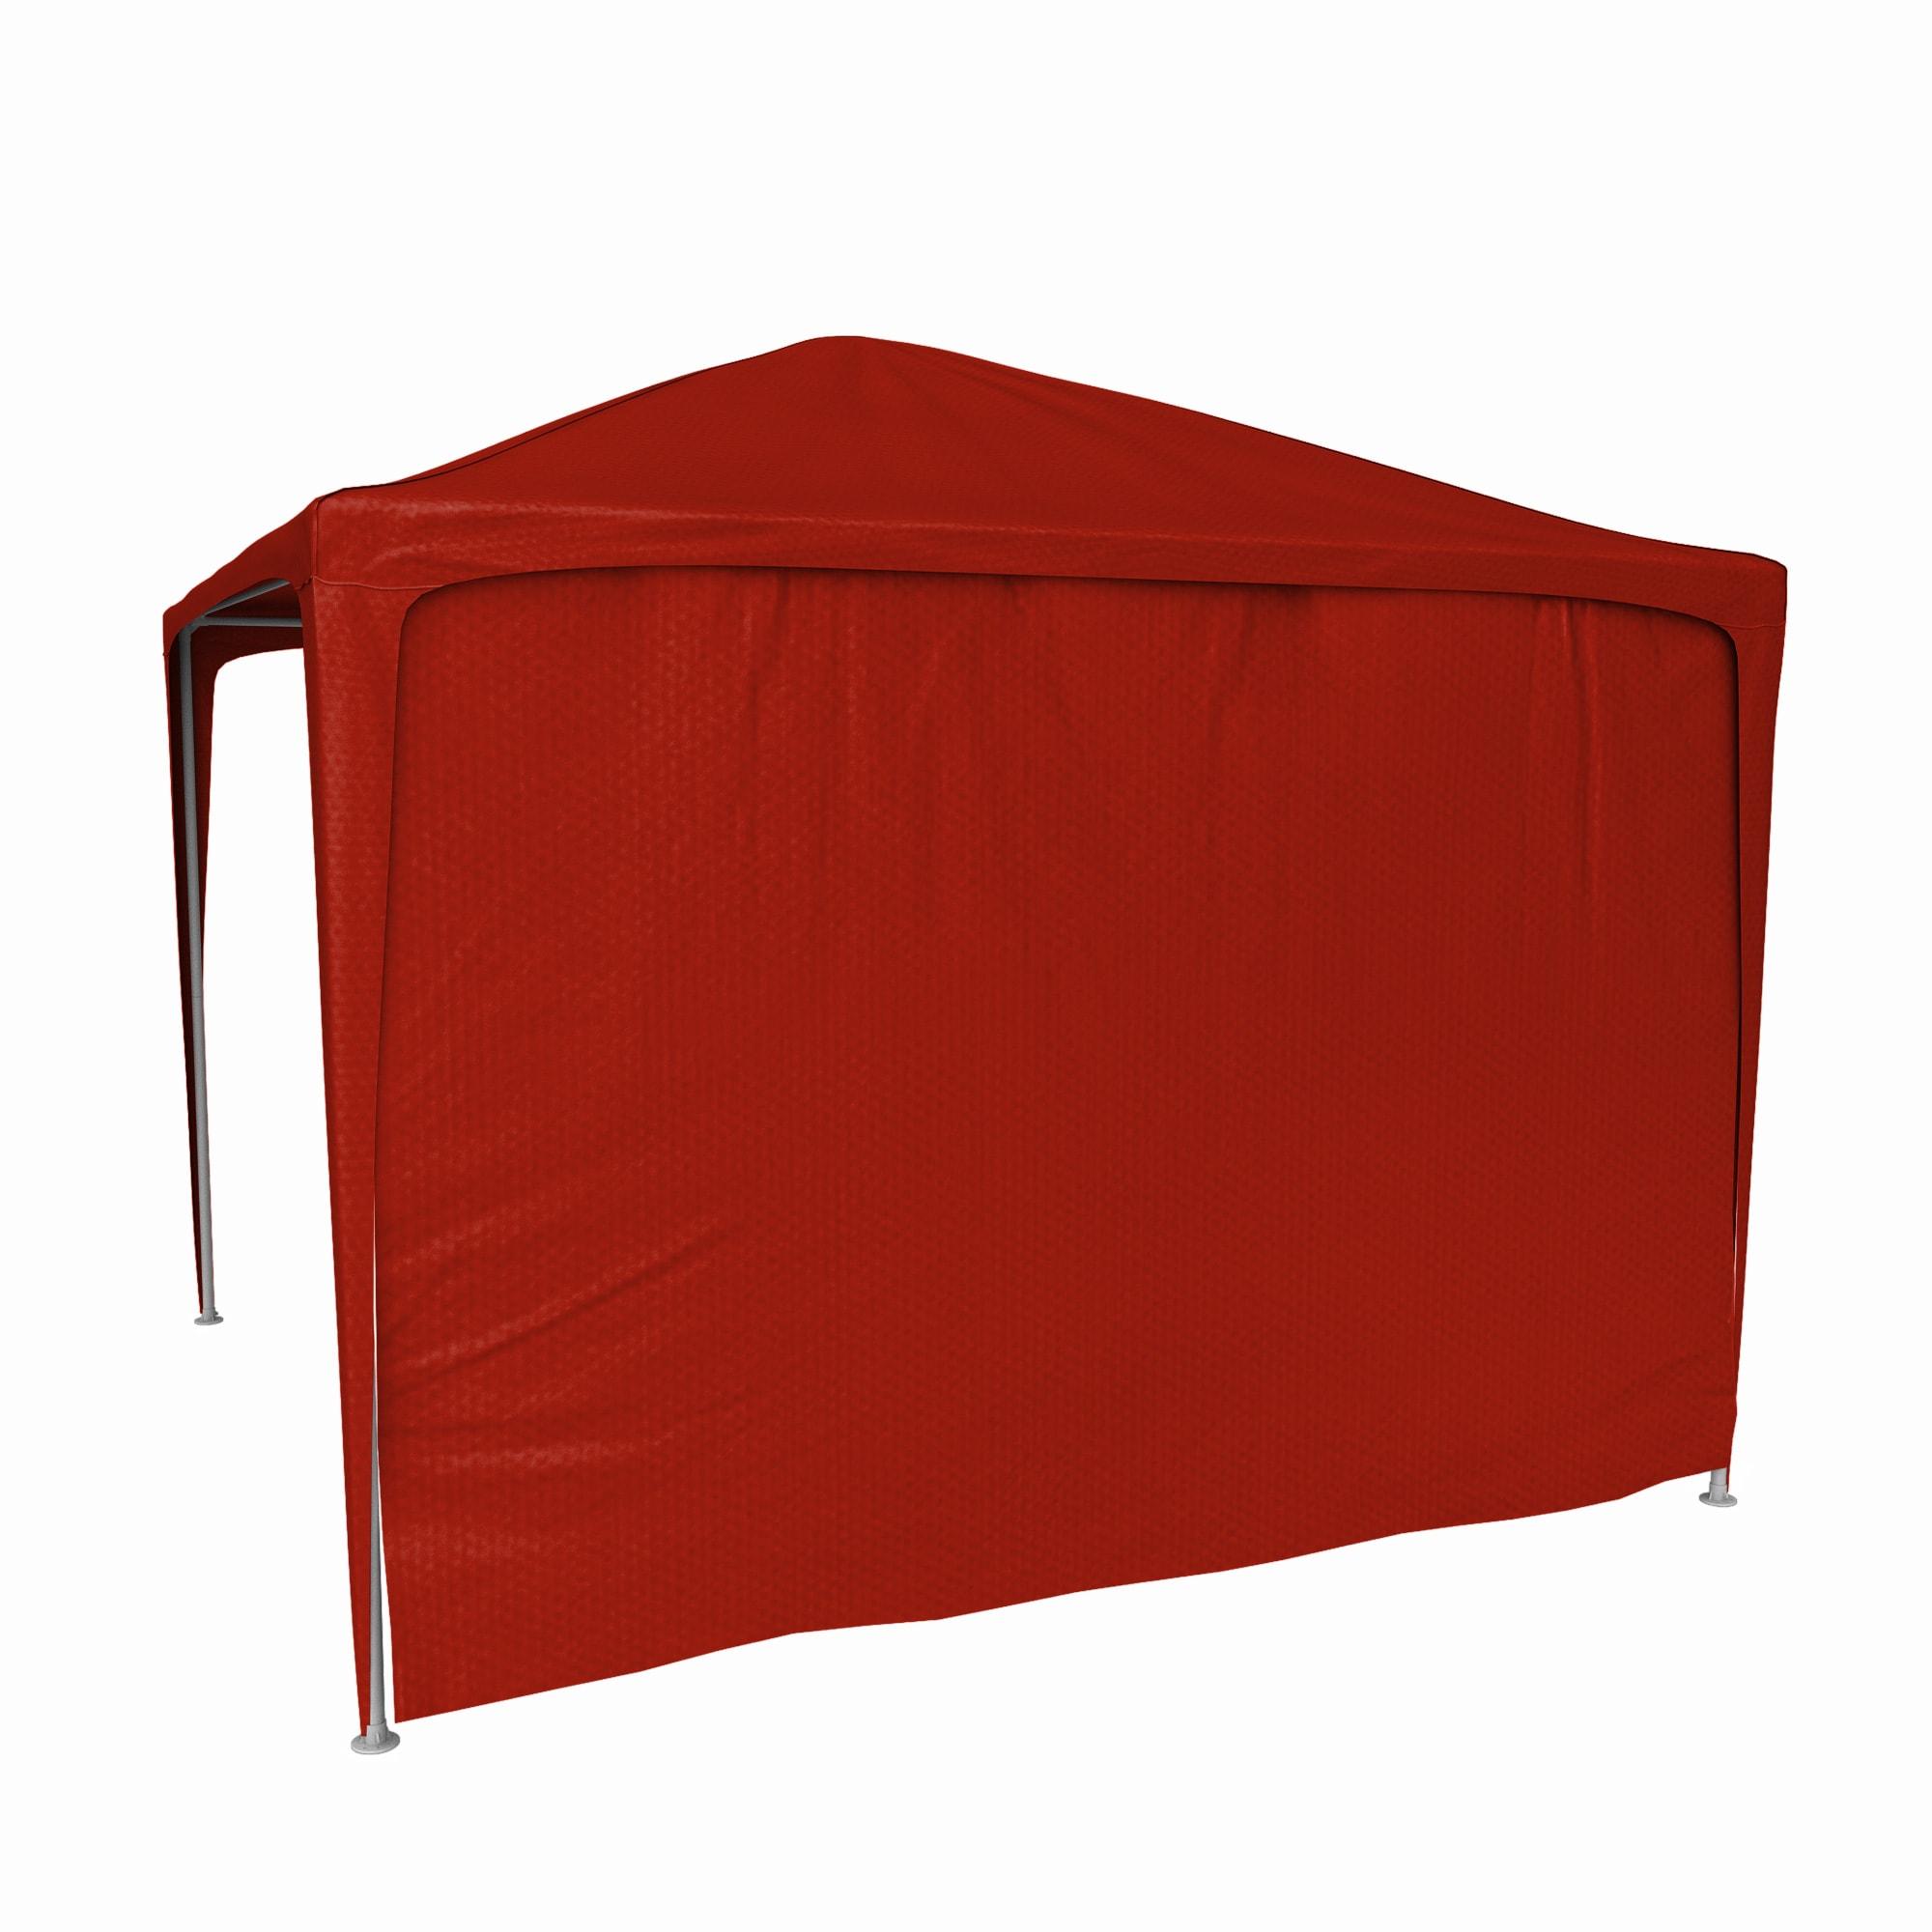 pavillon steckpavillon seitenteil fenster t r fliegengitter seitenwand partyzelt ebay. Black Bedroom Furniture Sets. Home Design Ideas